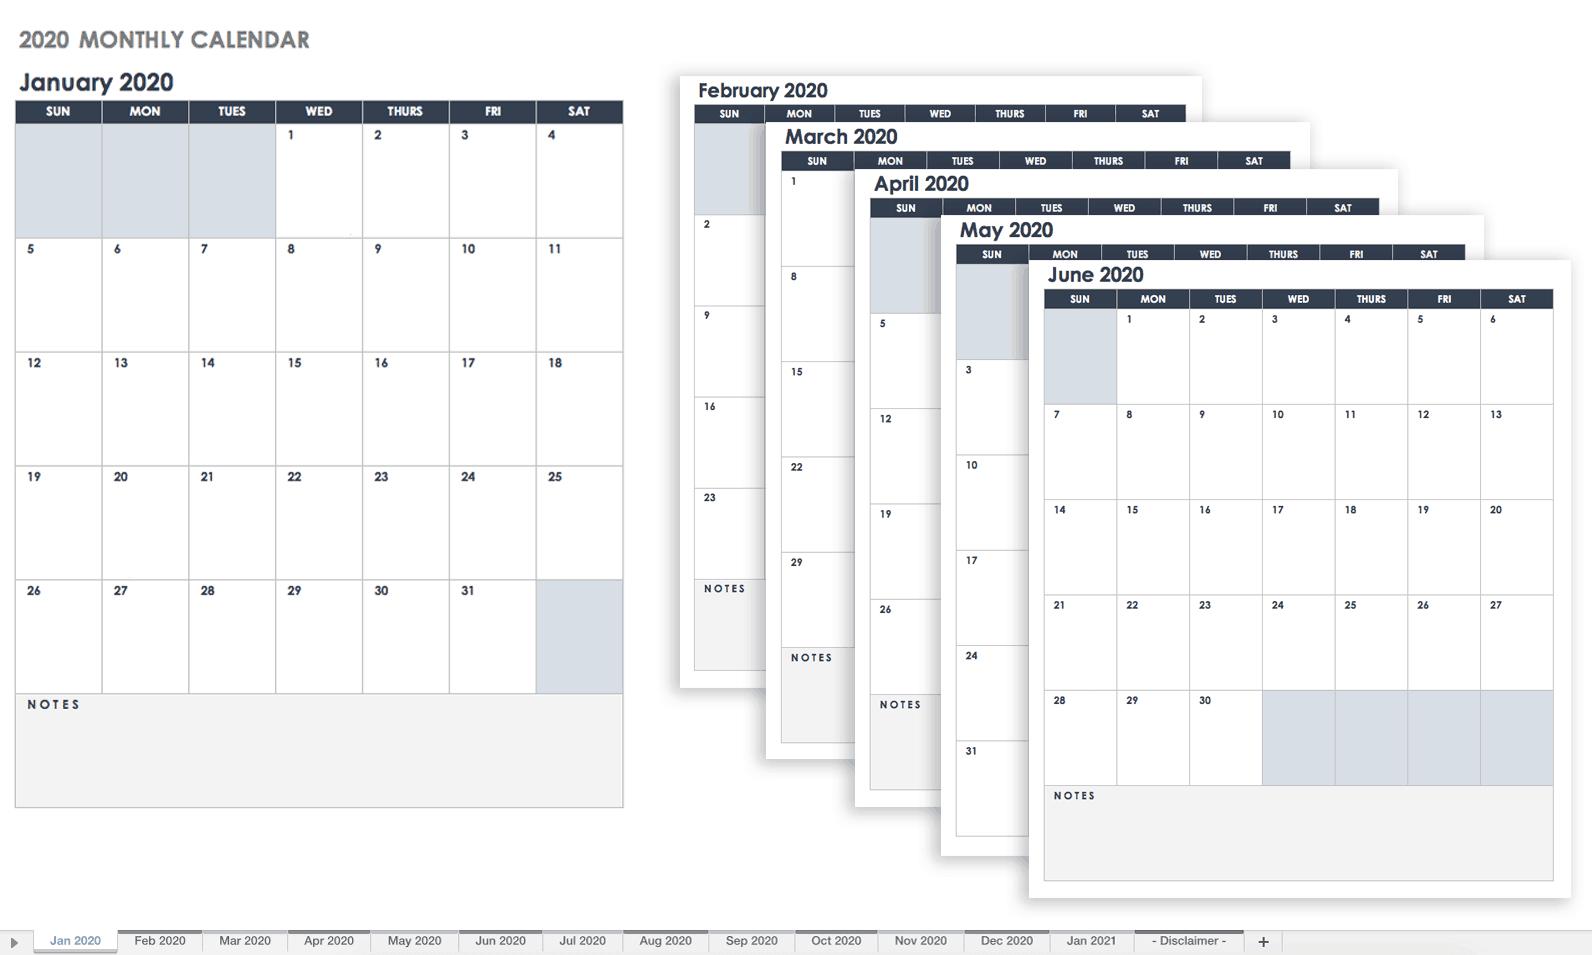 Free Google Calendar Templates | Smartsheet with 2020 Employee Attendance Calendar Free